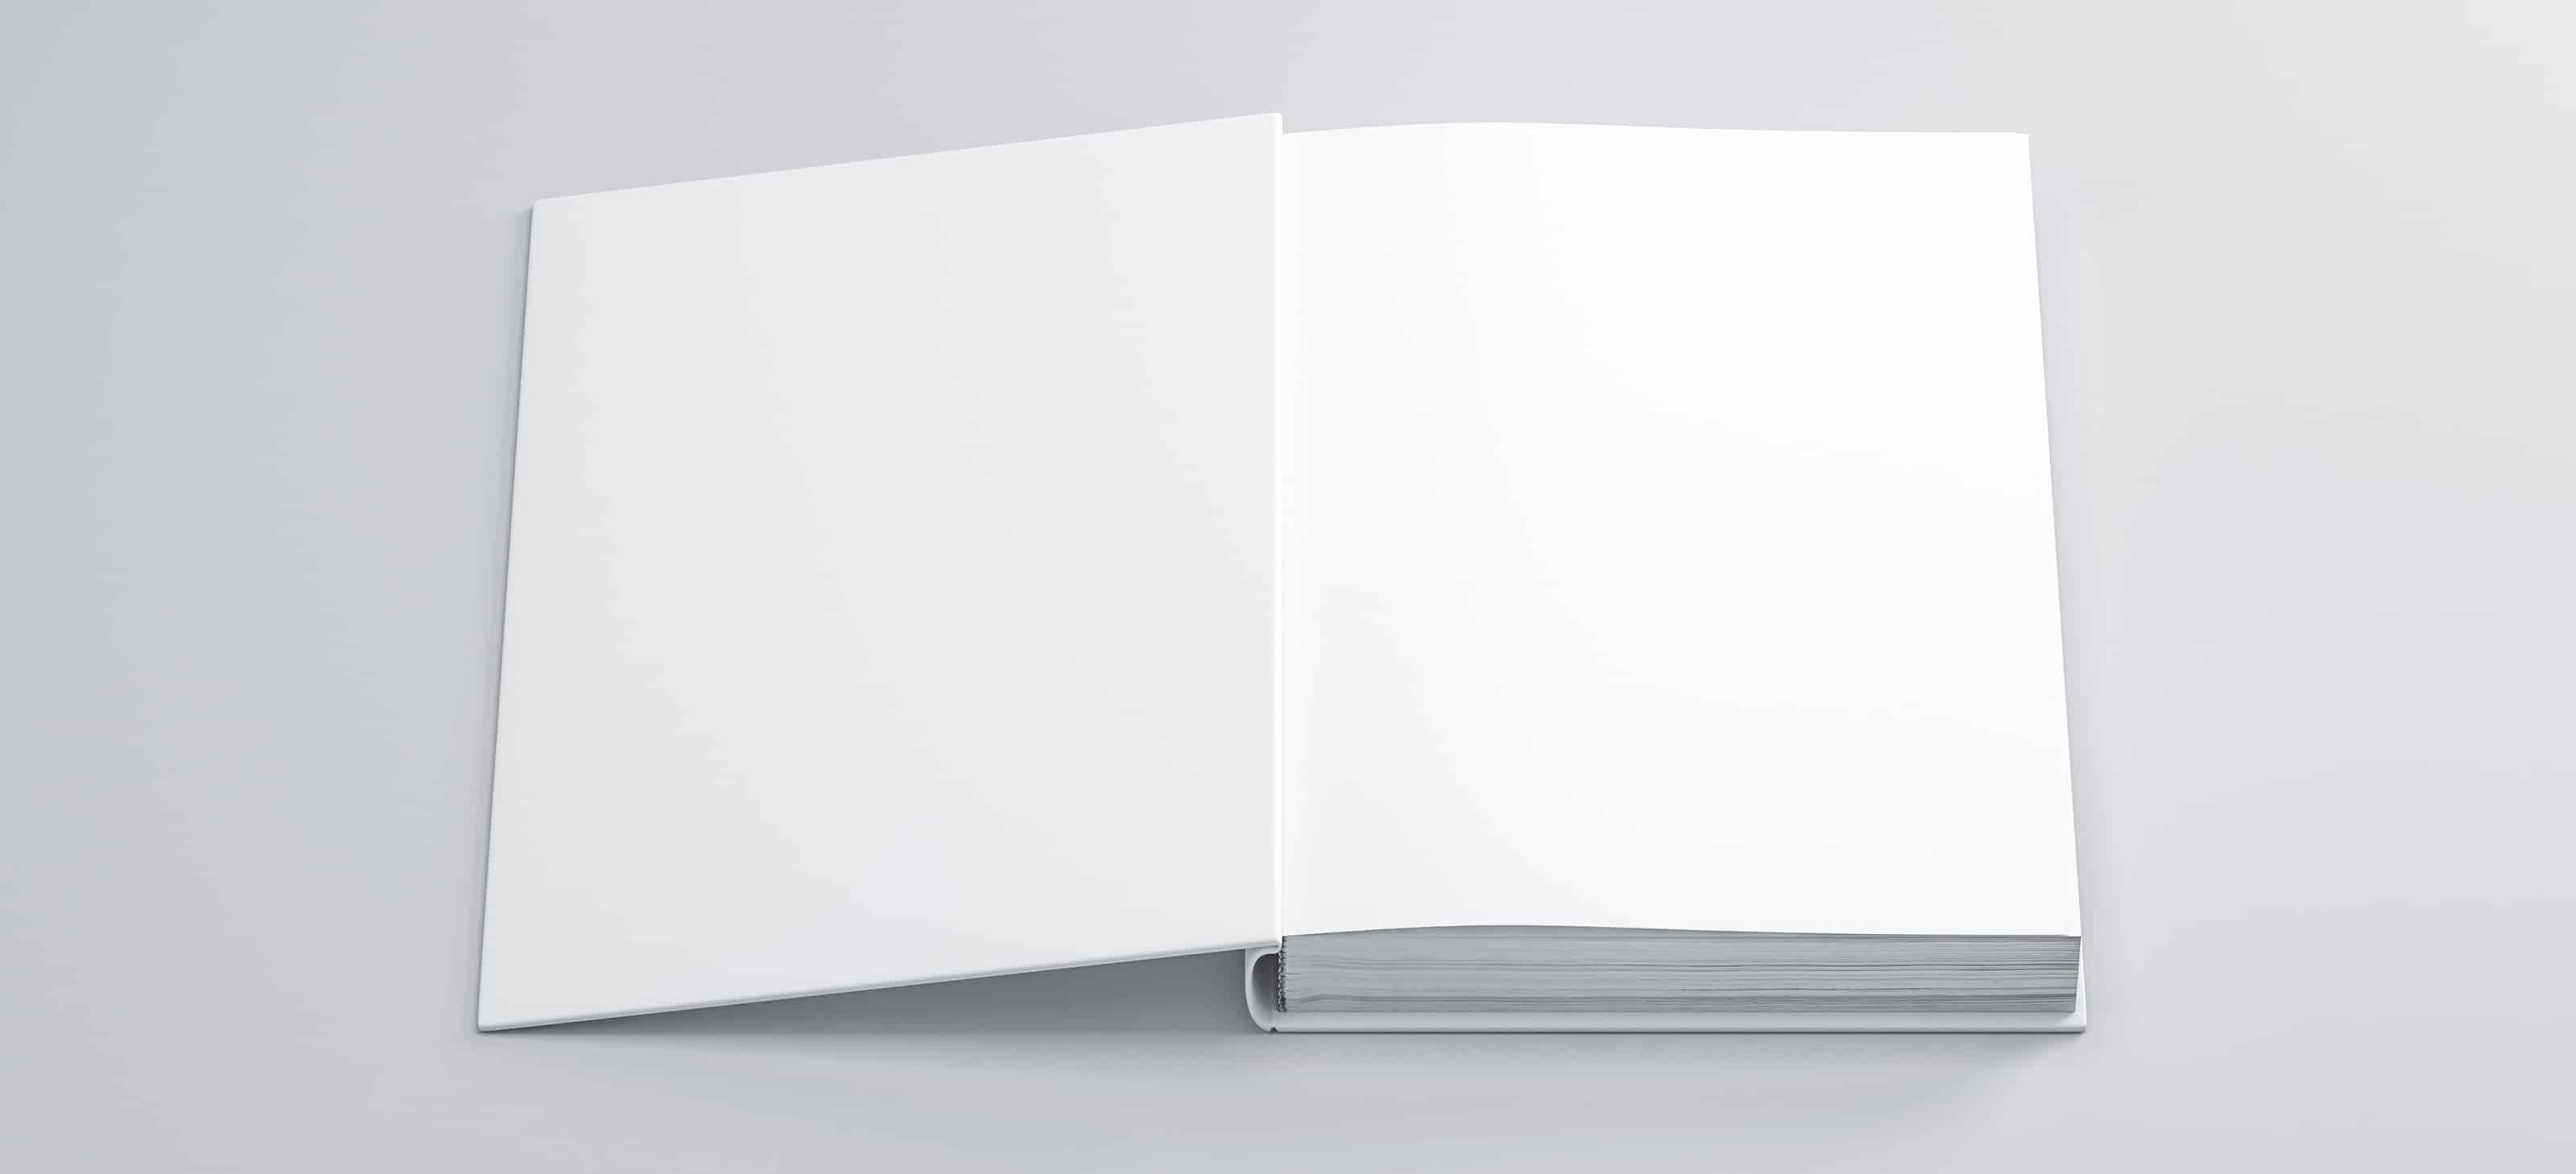 bind-hardcover-books